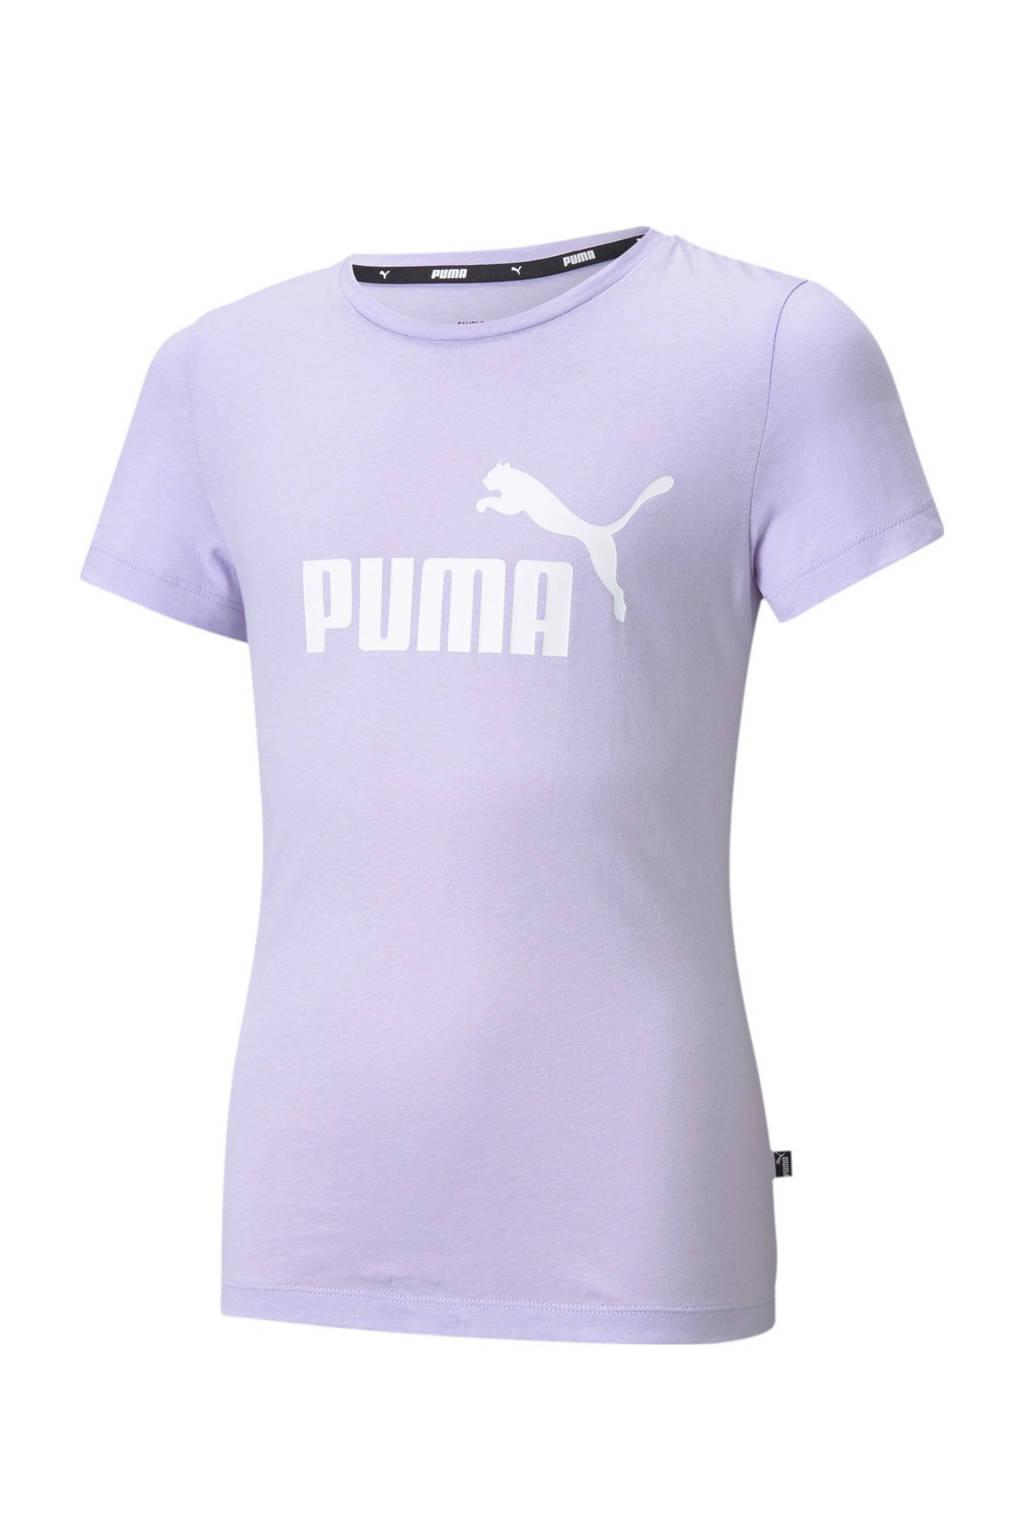 Puma T-shirt lila, Lila